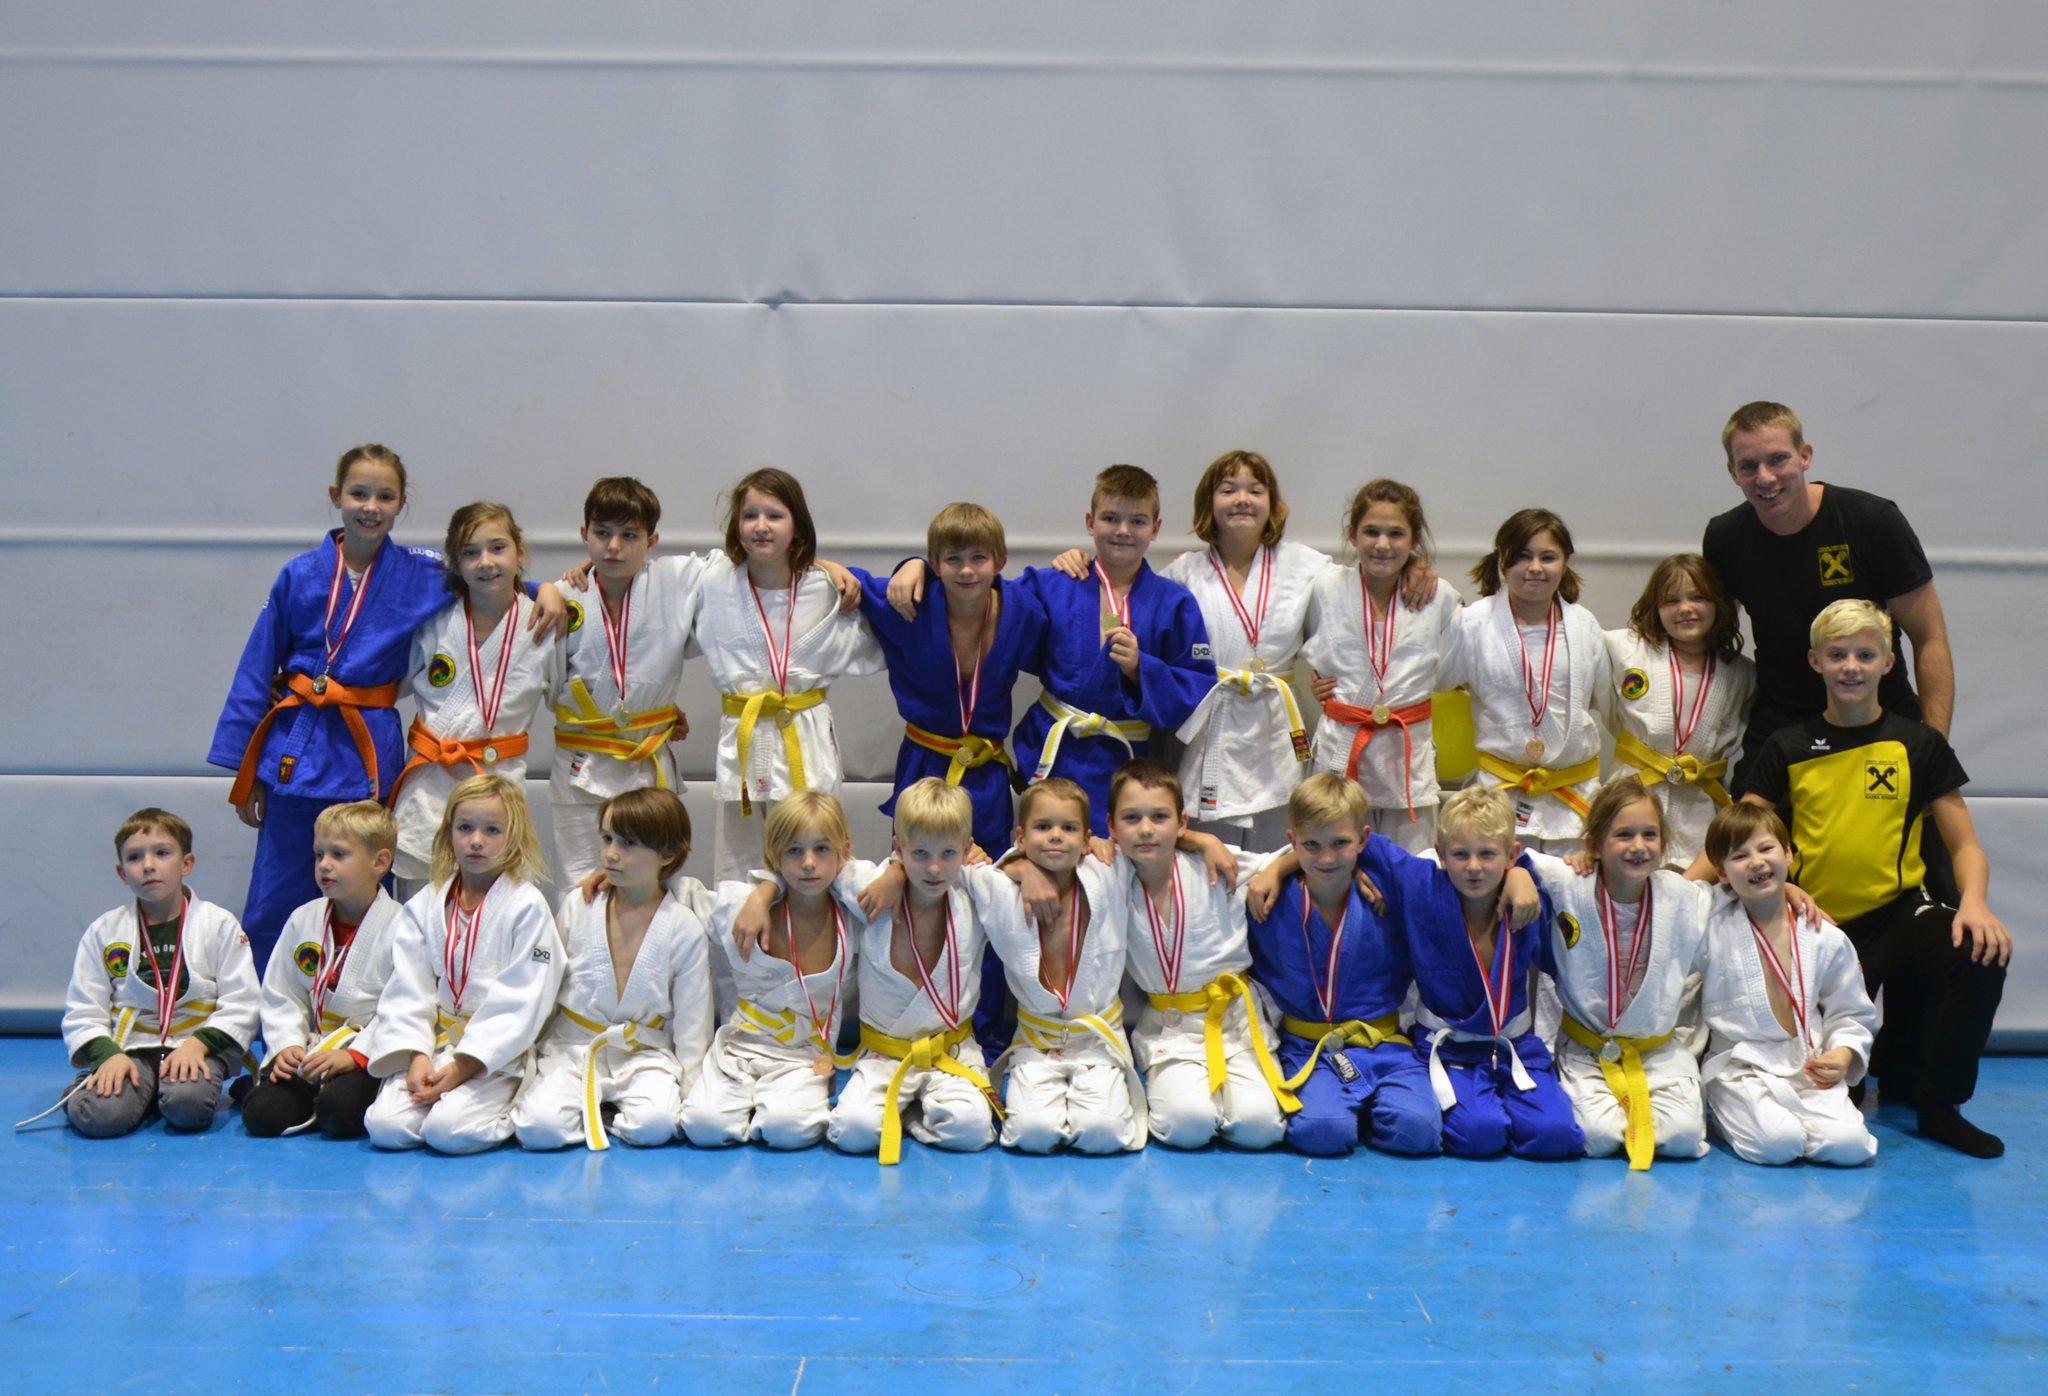 Union Judo Raika Krems: Judonachwuchs, klein aber oho! - Krems - meinbezirk.at